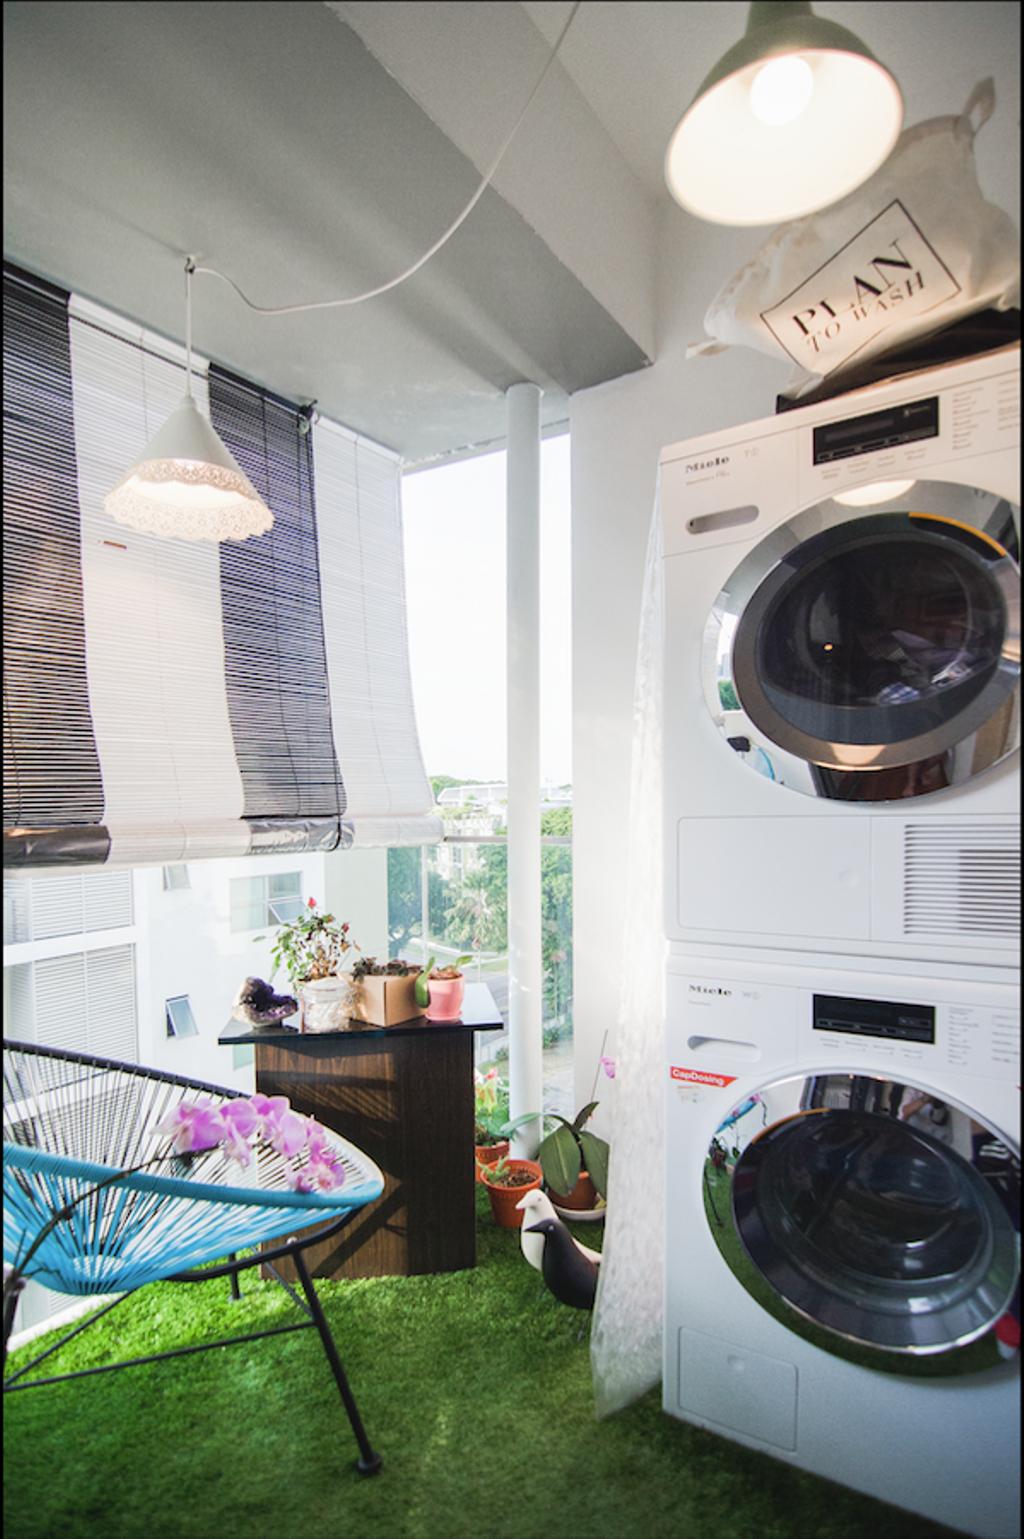 Retro, Condo, Balcony, Aspen LinQ, Interior Designer, Create, Eclectic, Appliance, Electrical Device, Washer